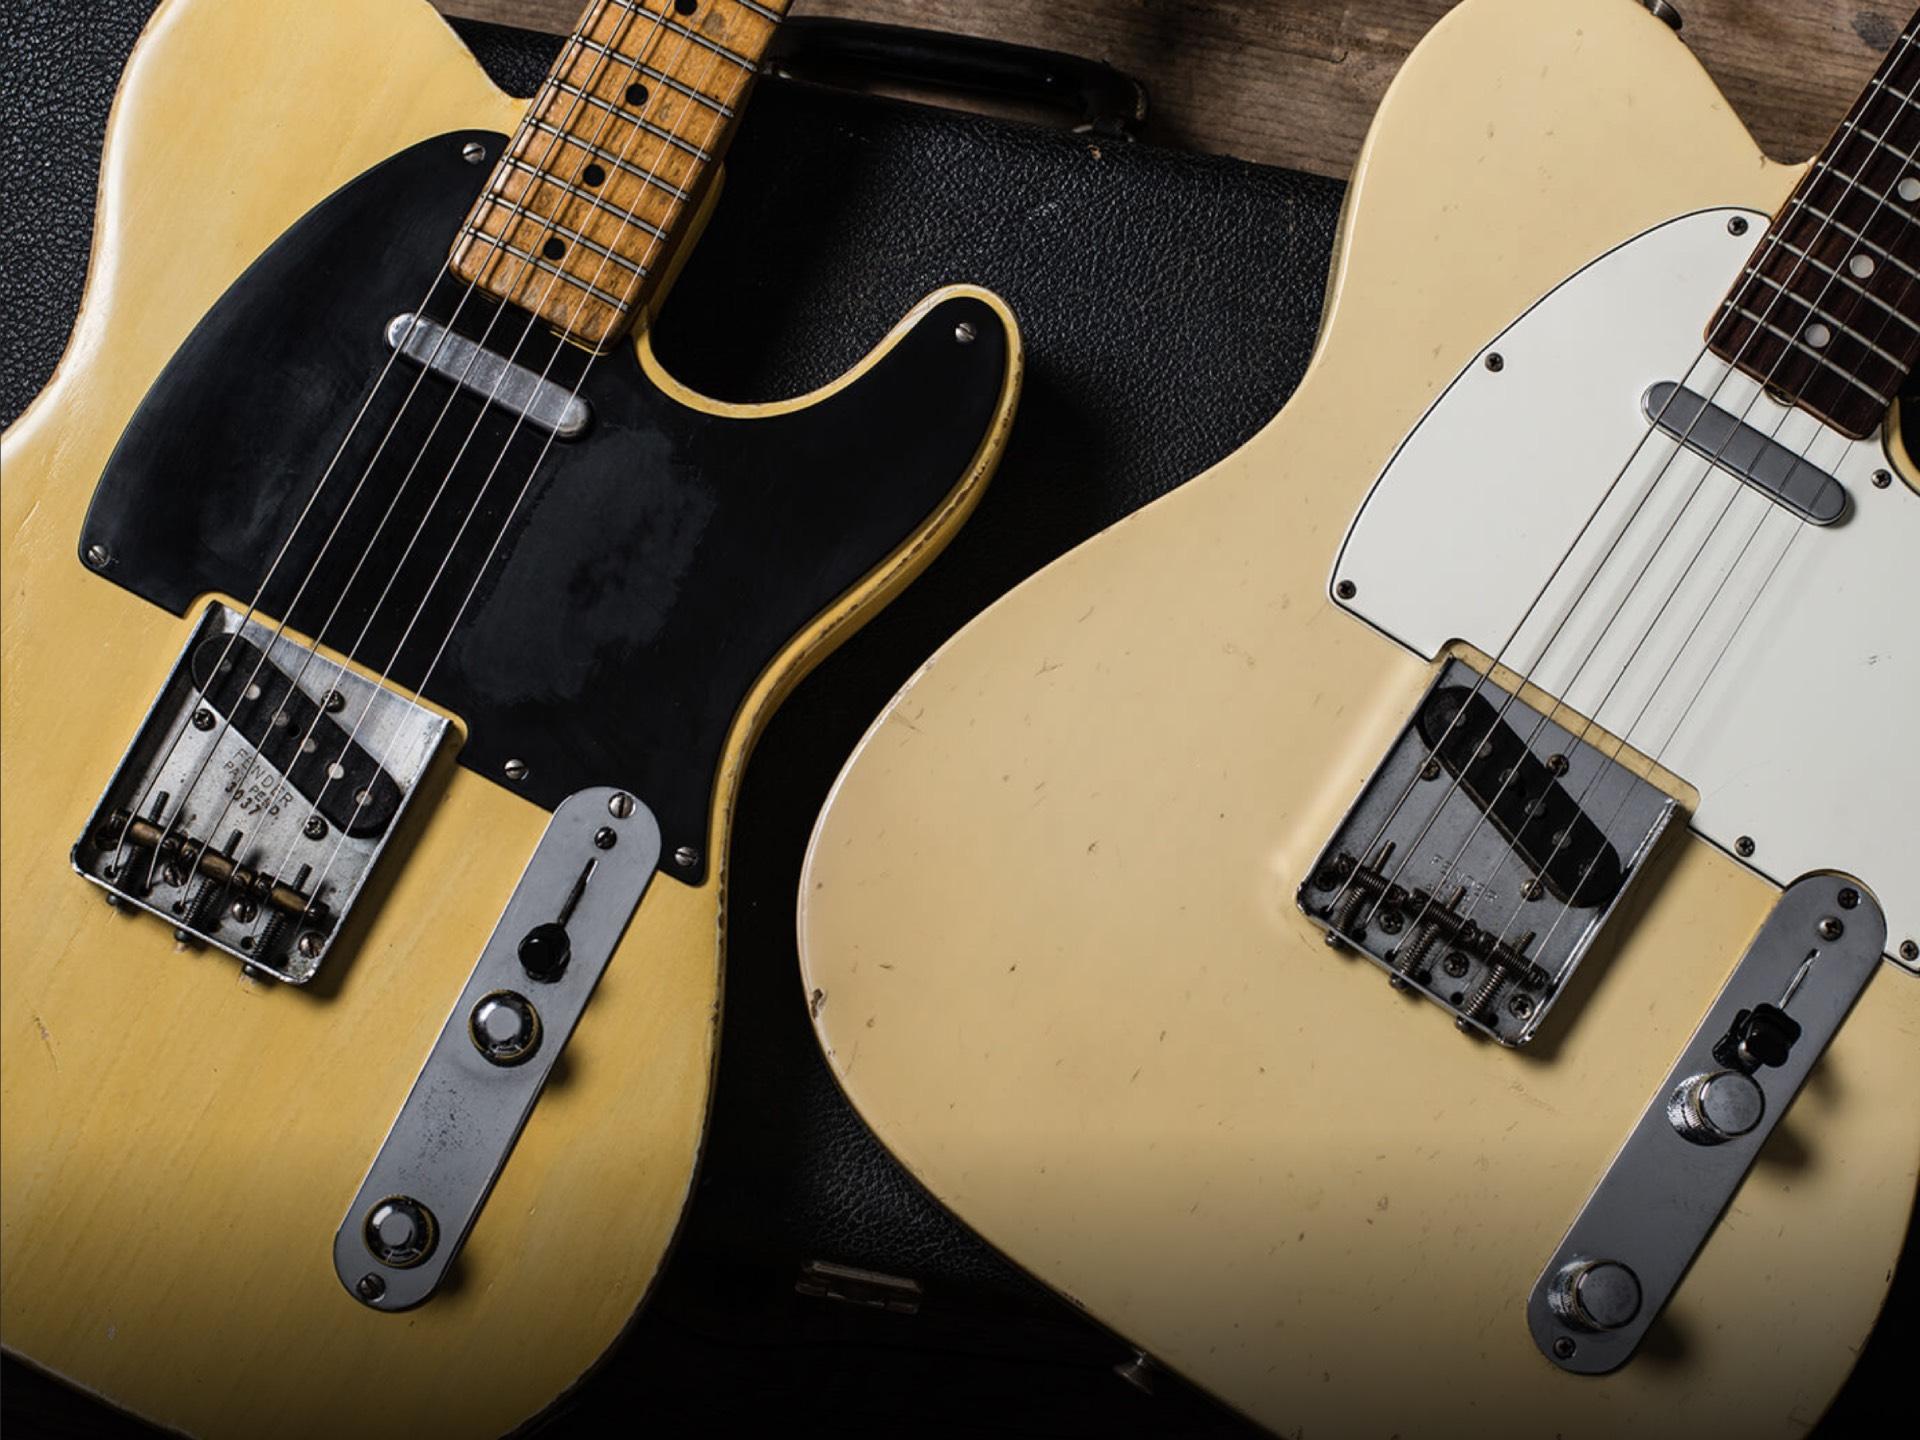 1952 &1968 Fender Telecasters